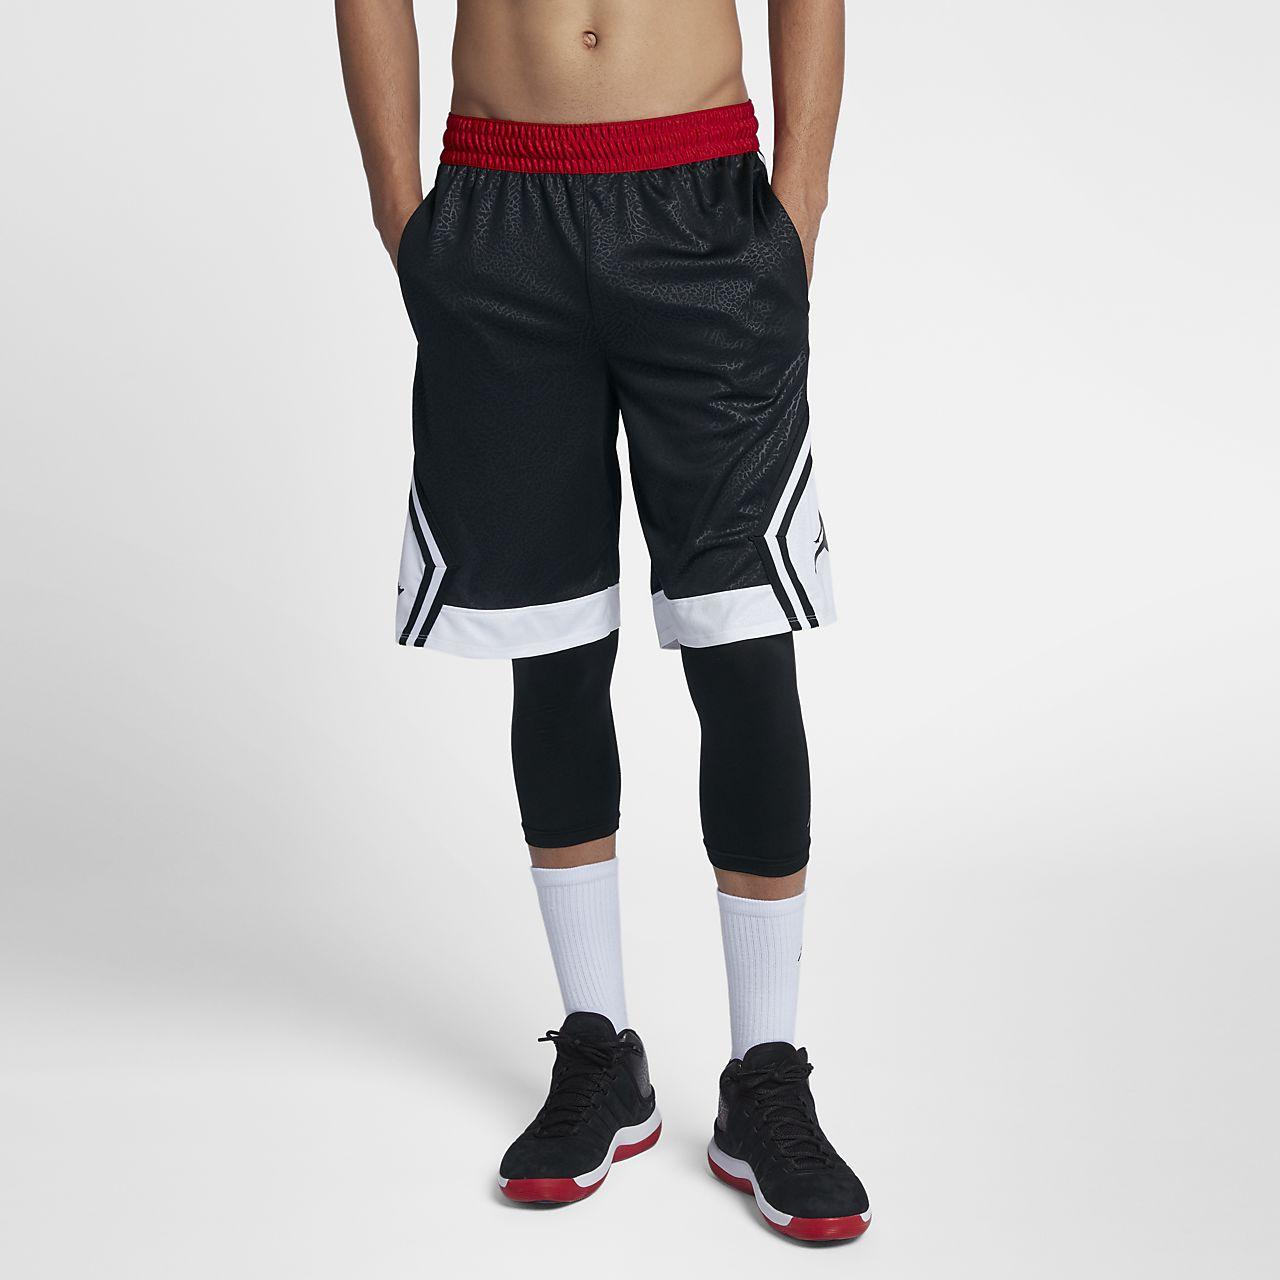 ... Jordan Rise Diamond Men's Basketball Shorts